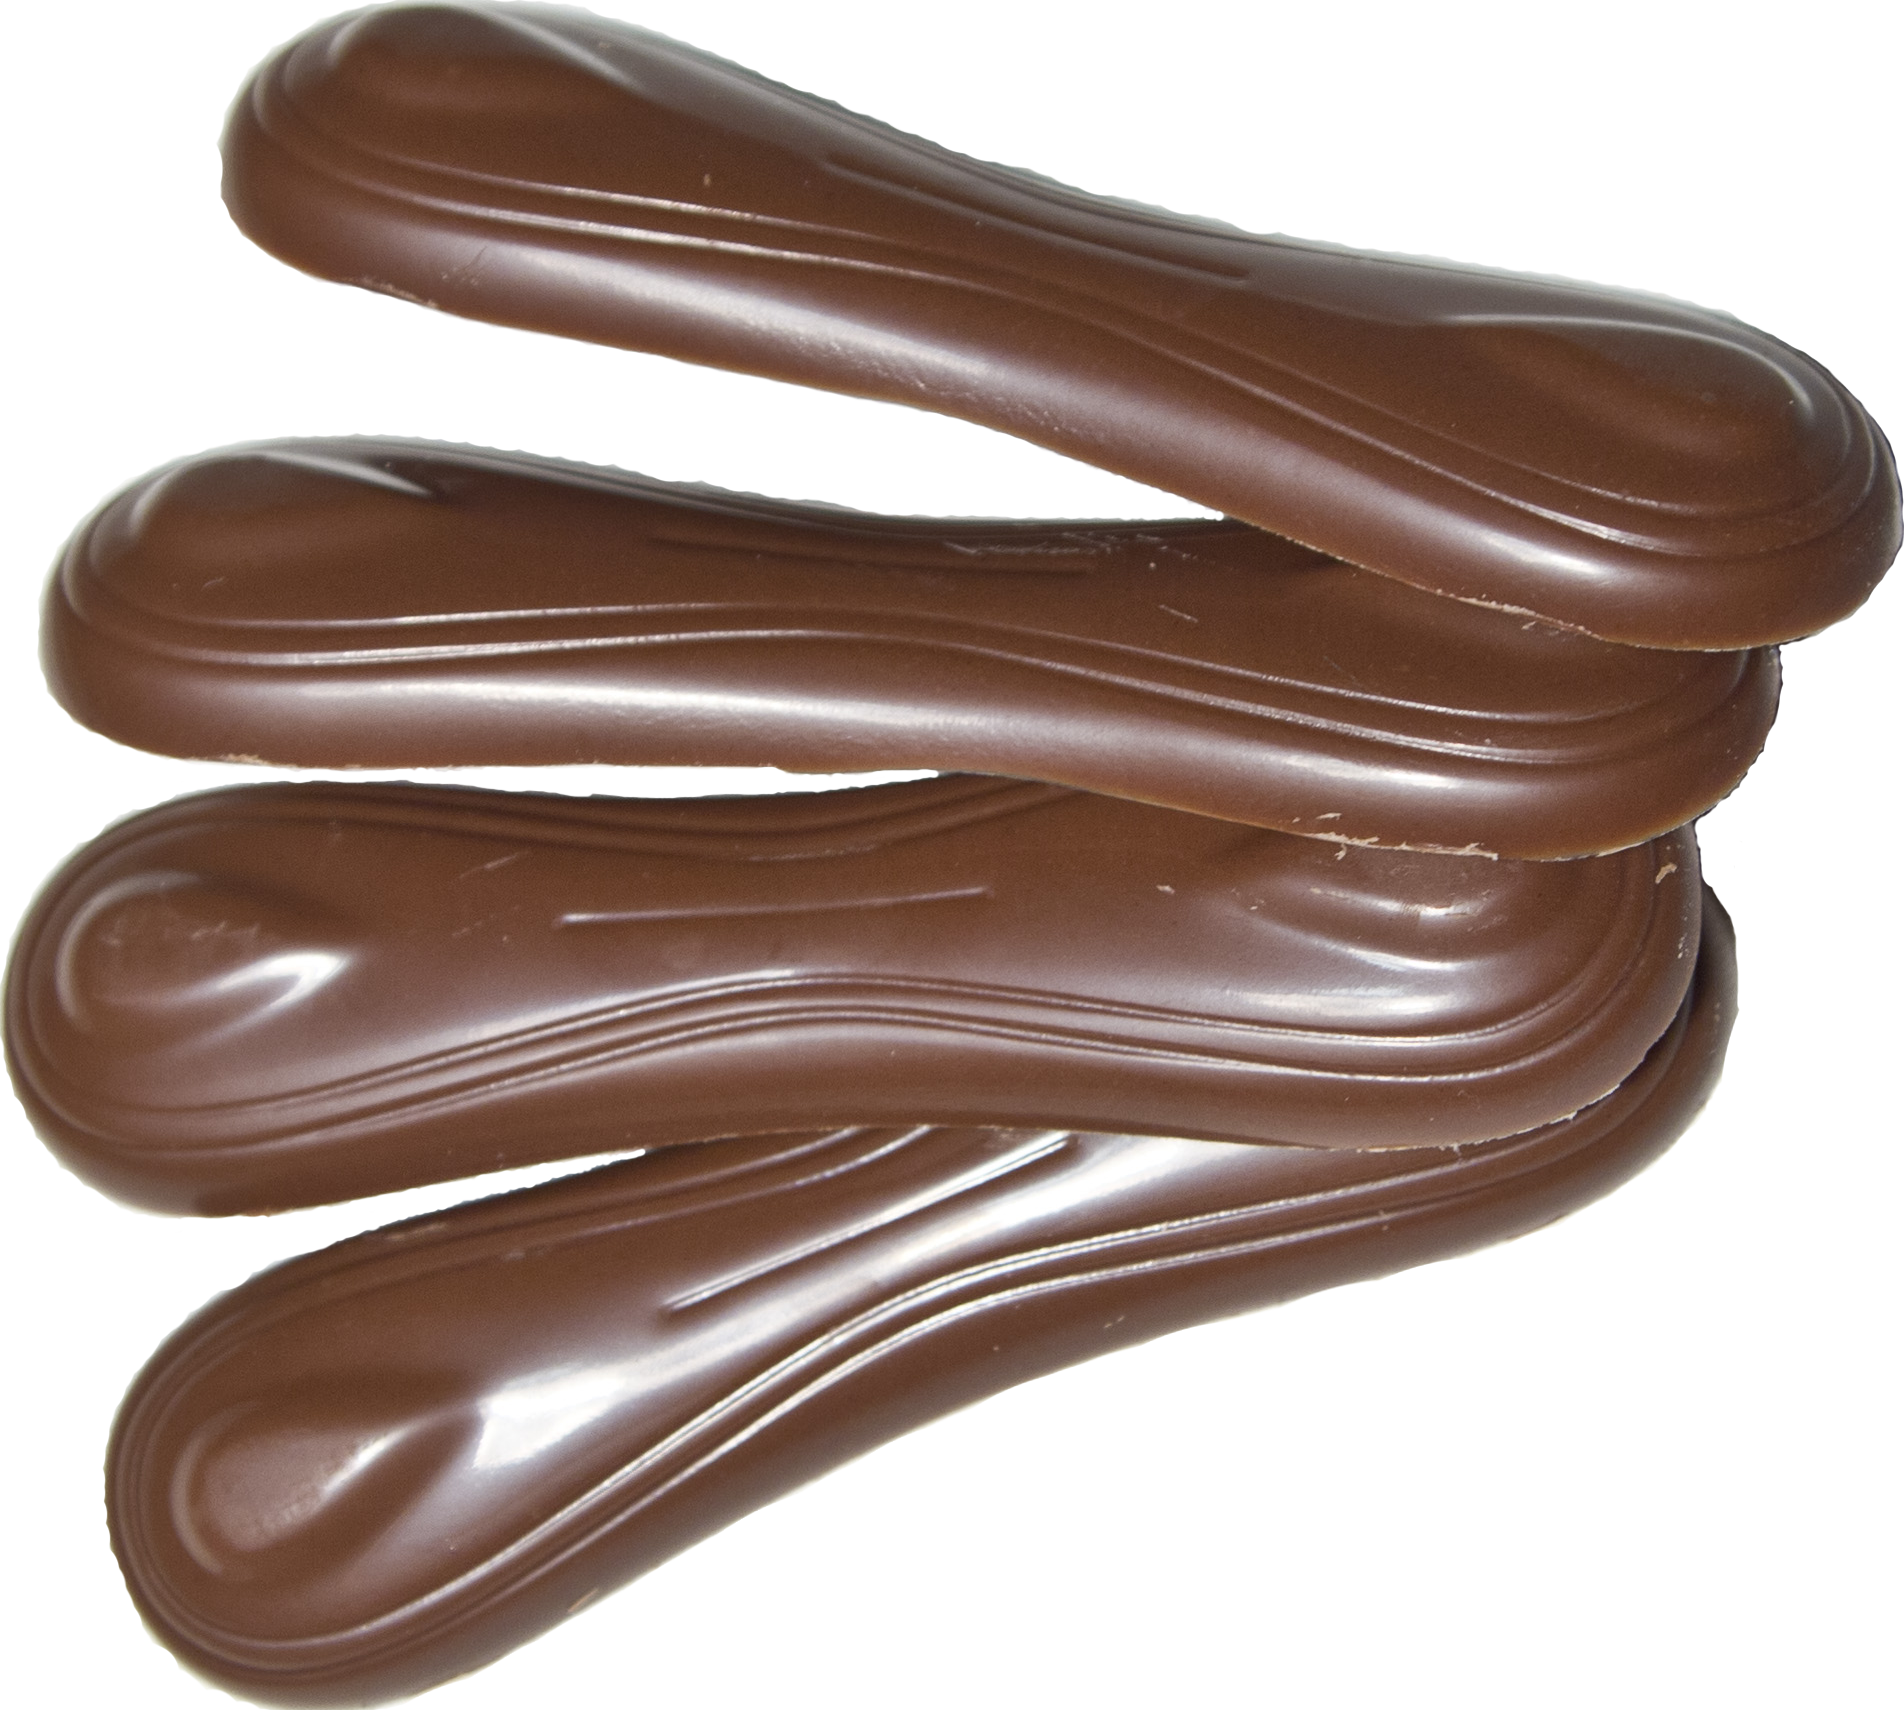 Milk Chocolate Description